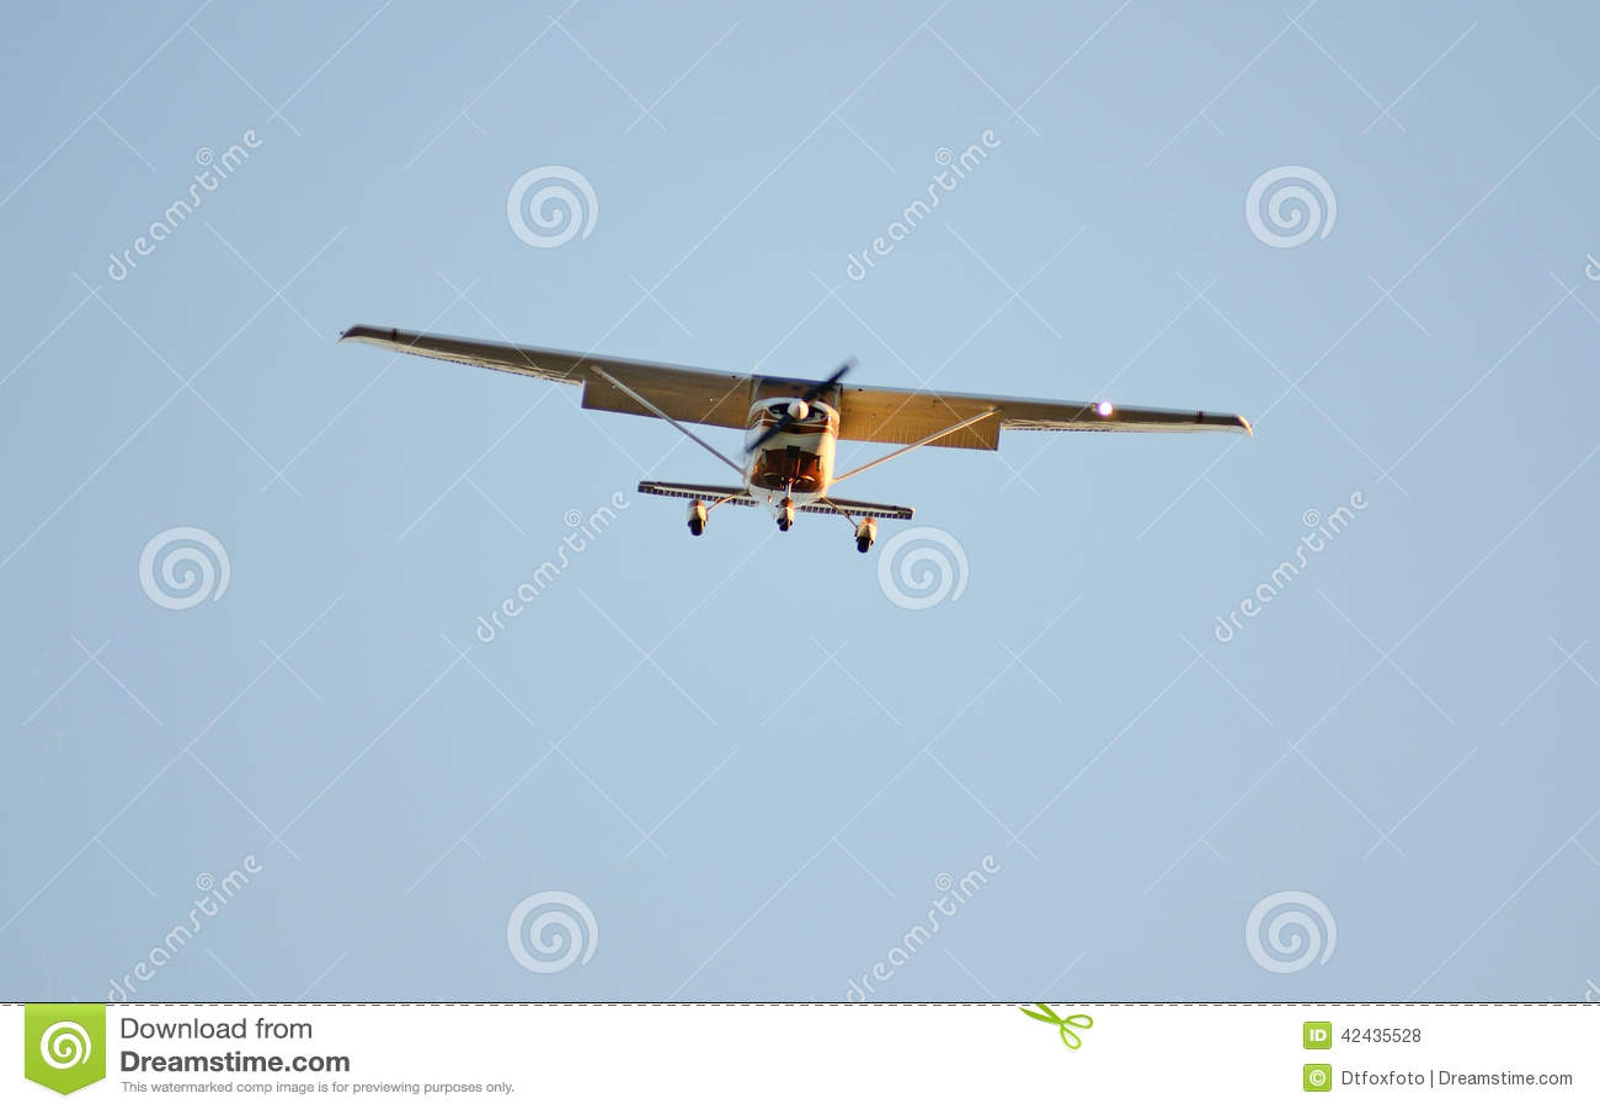 Aterrizaje plano